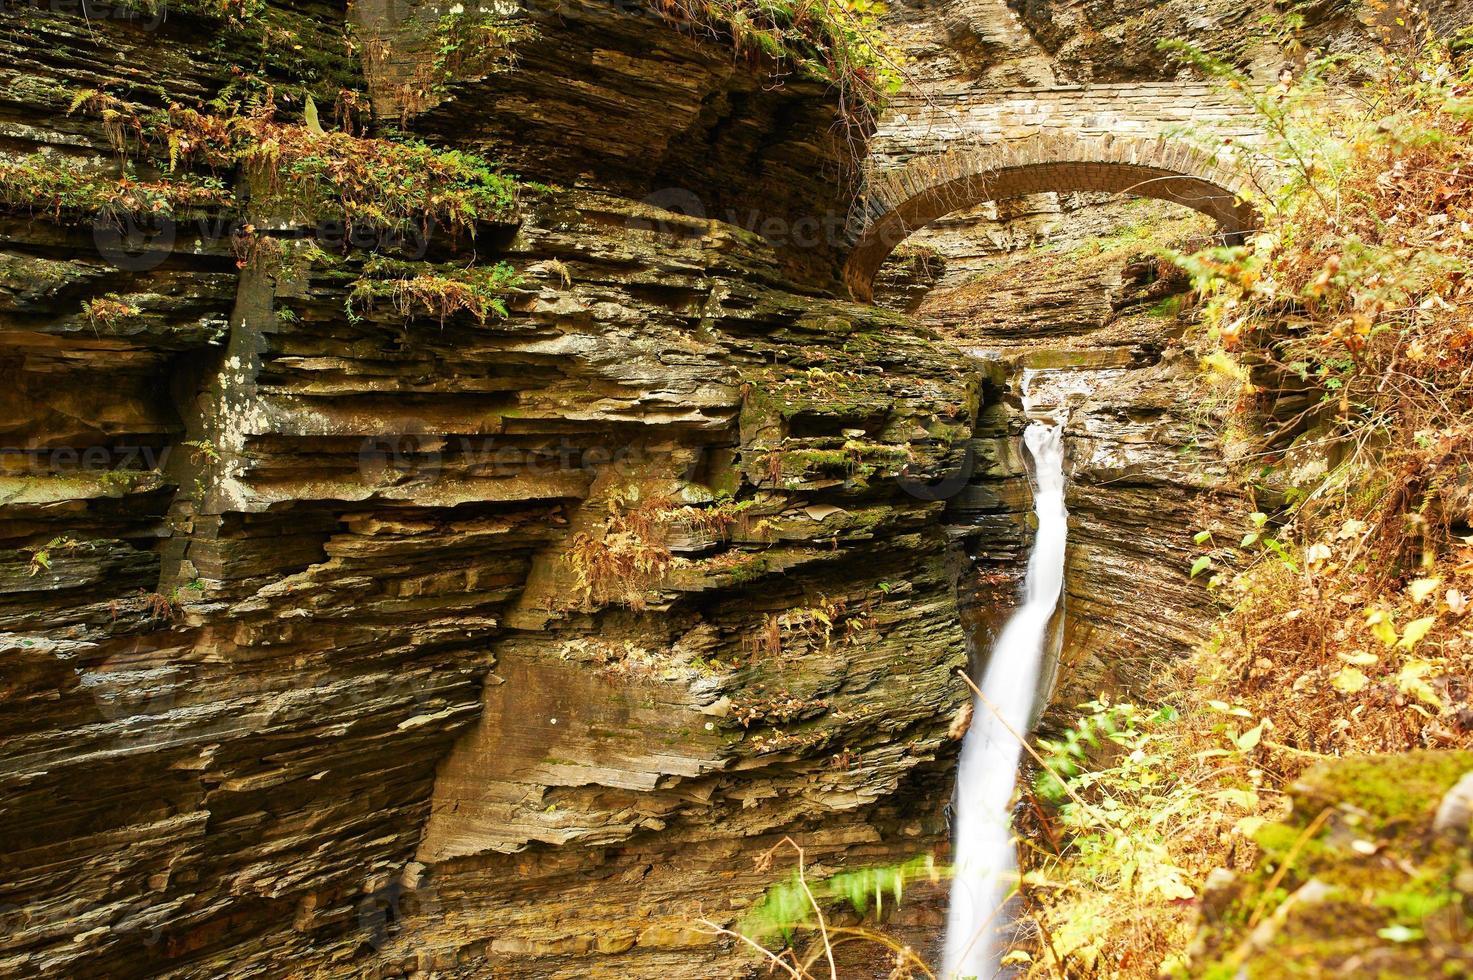 grotta vattenfall på watkins glen State Park foto